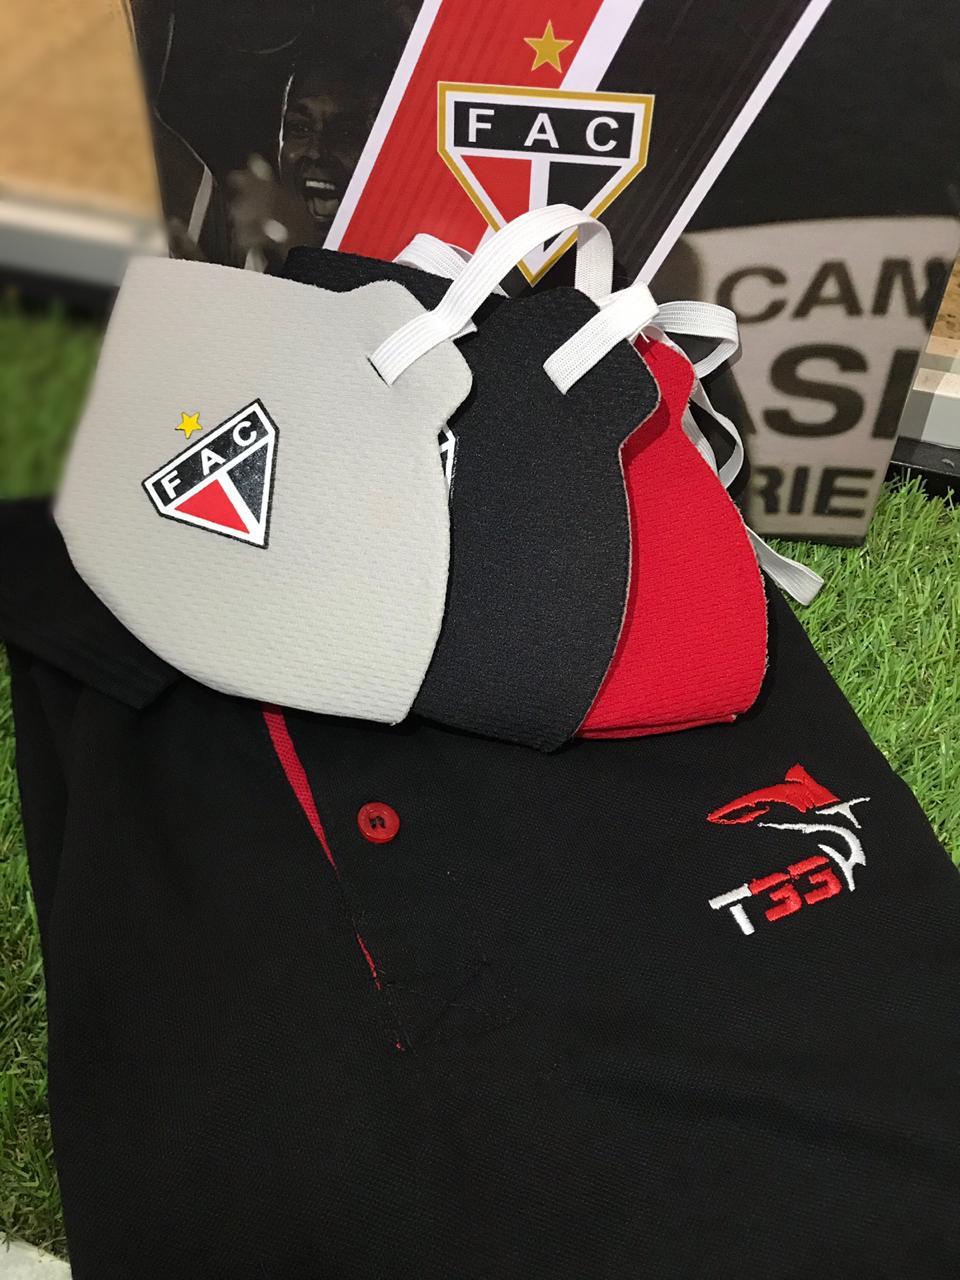 Kit do pais (polo T33 + kit mascaras + caixa)  - Ferrão Store